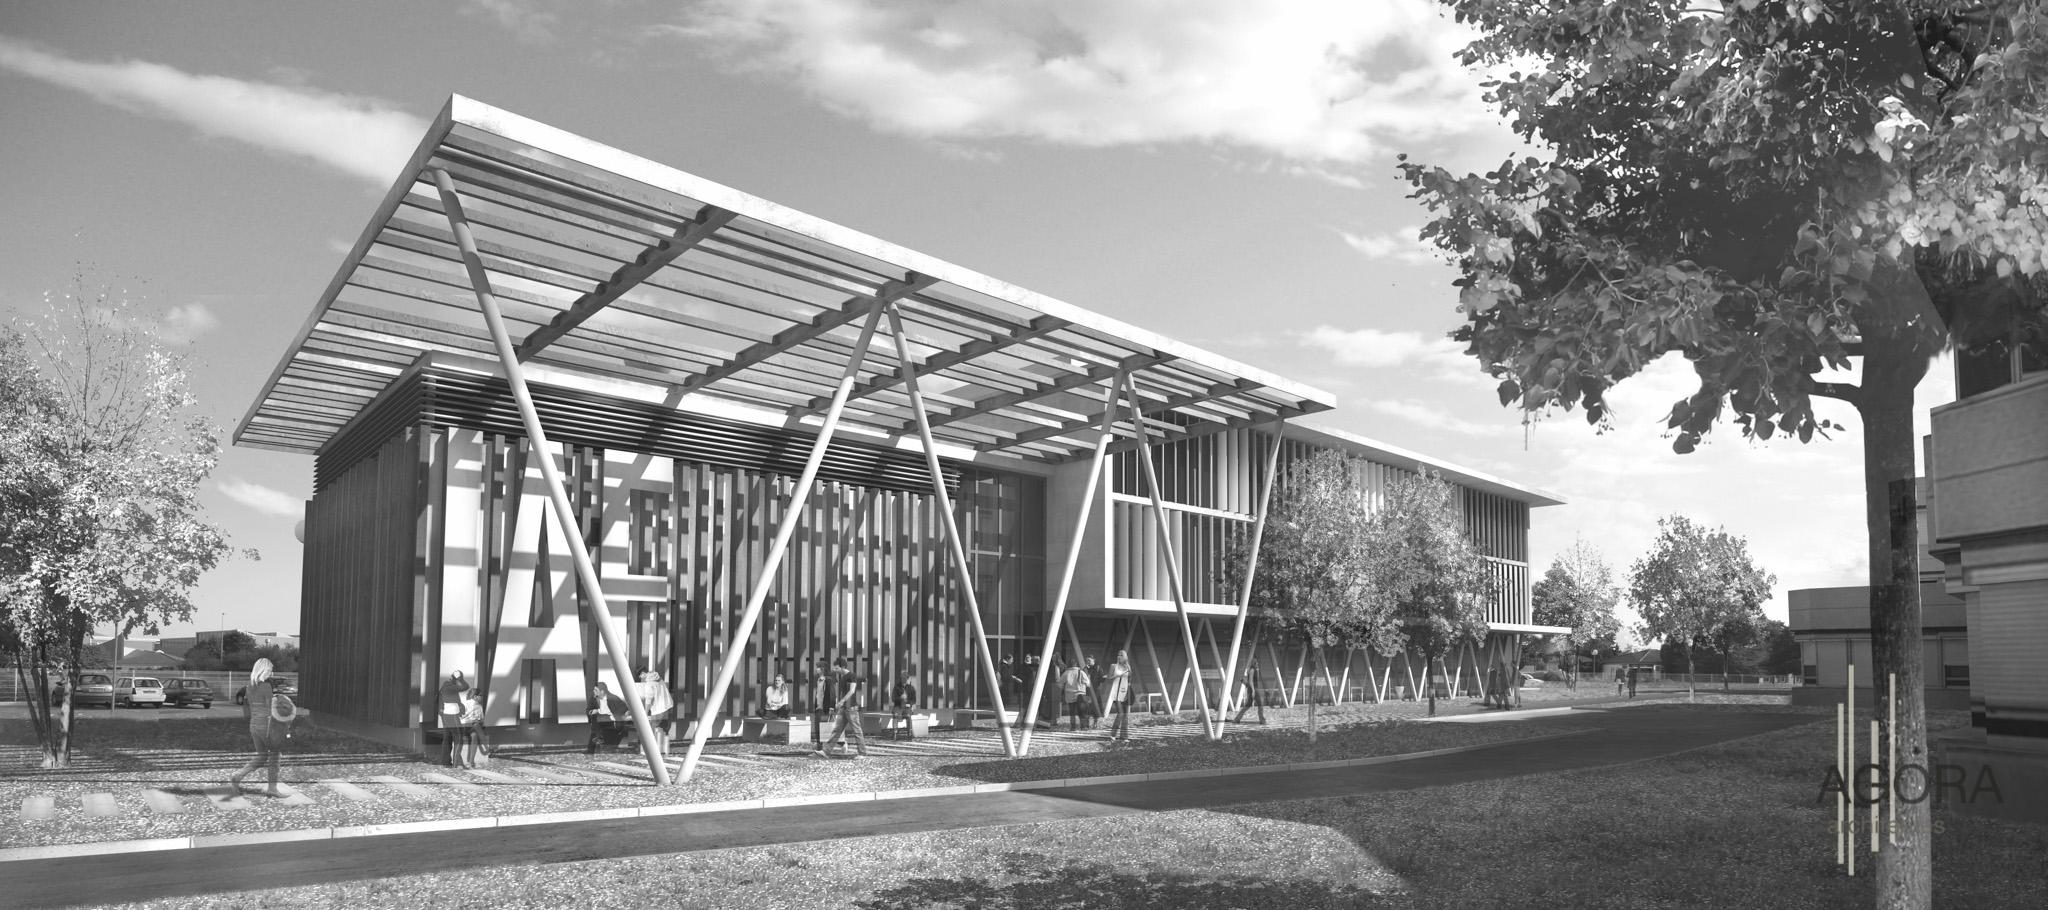 concours iae universit pierre mend s france valence 26 agora architectes grenoble. Black Bedroom Furniture Sets. Home Design Ideas